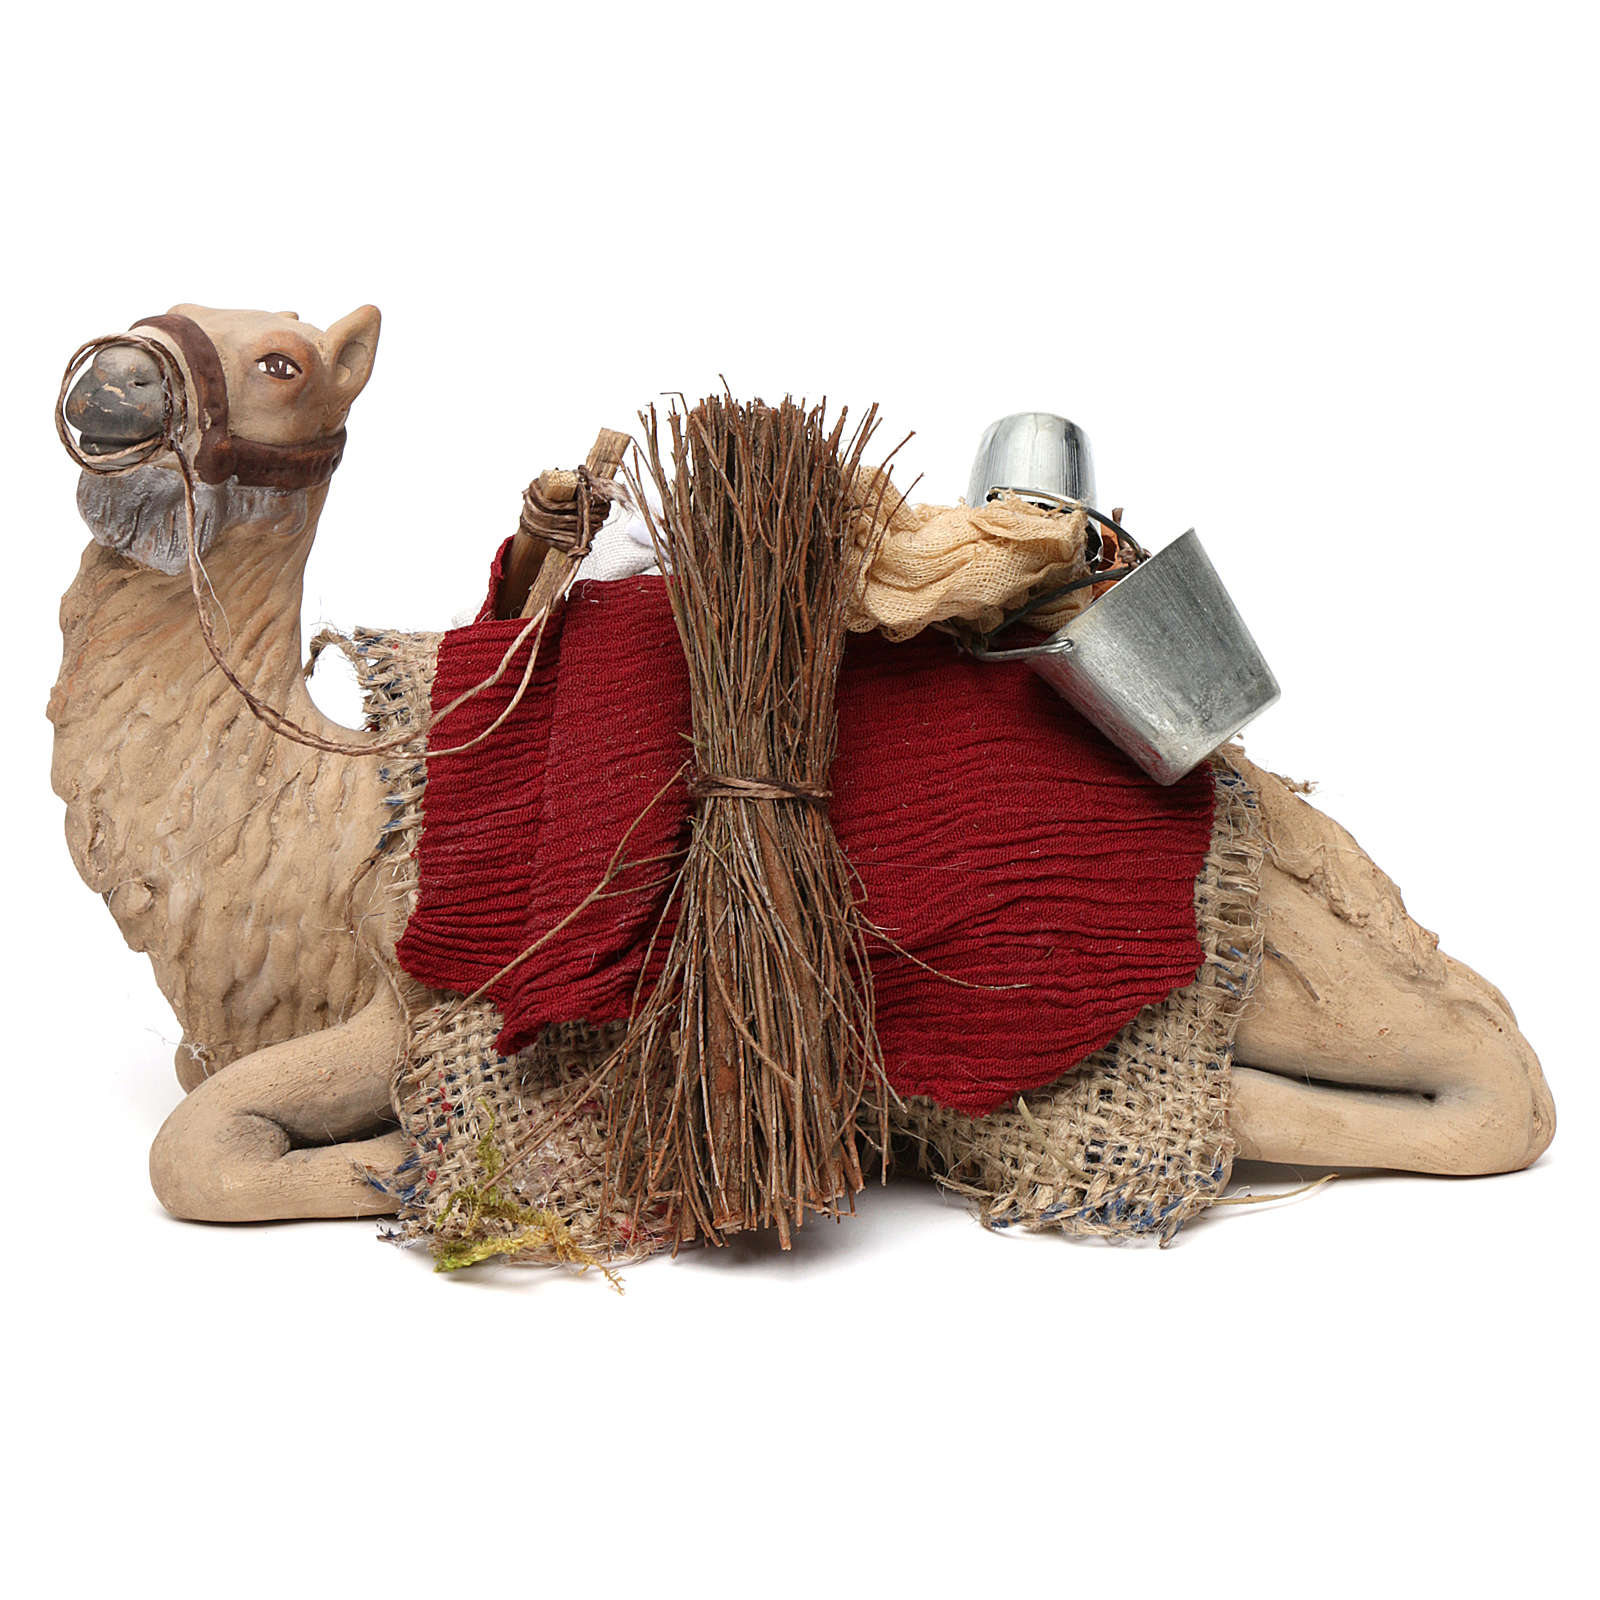 Harnessed sitting camel for Neapolitan nativity 14cm 4